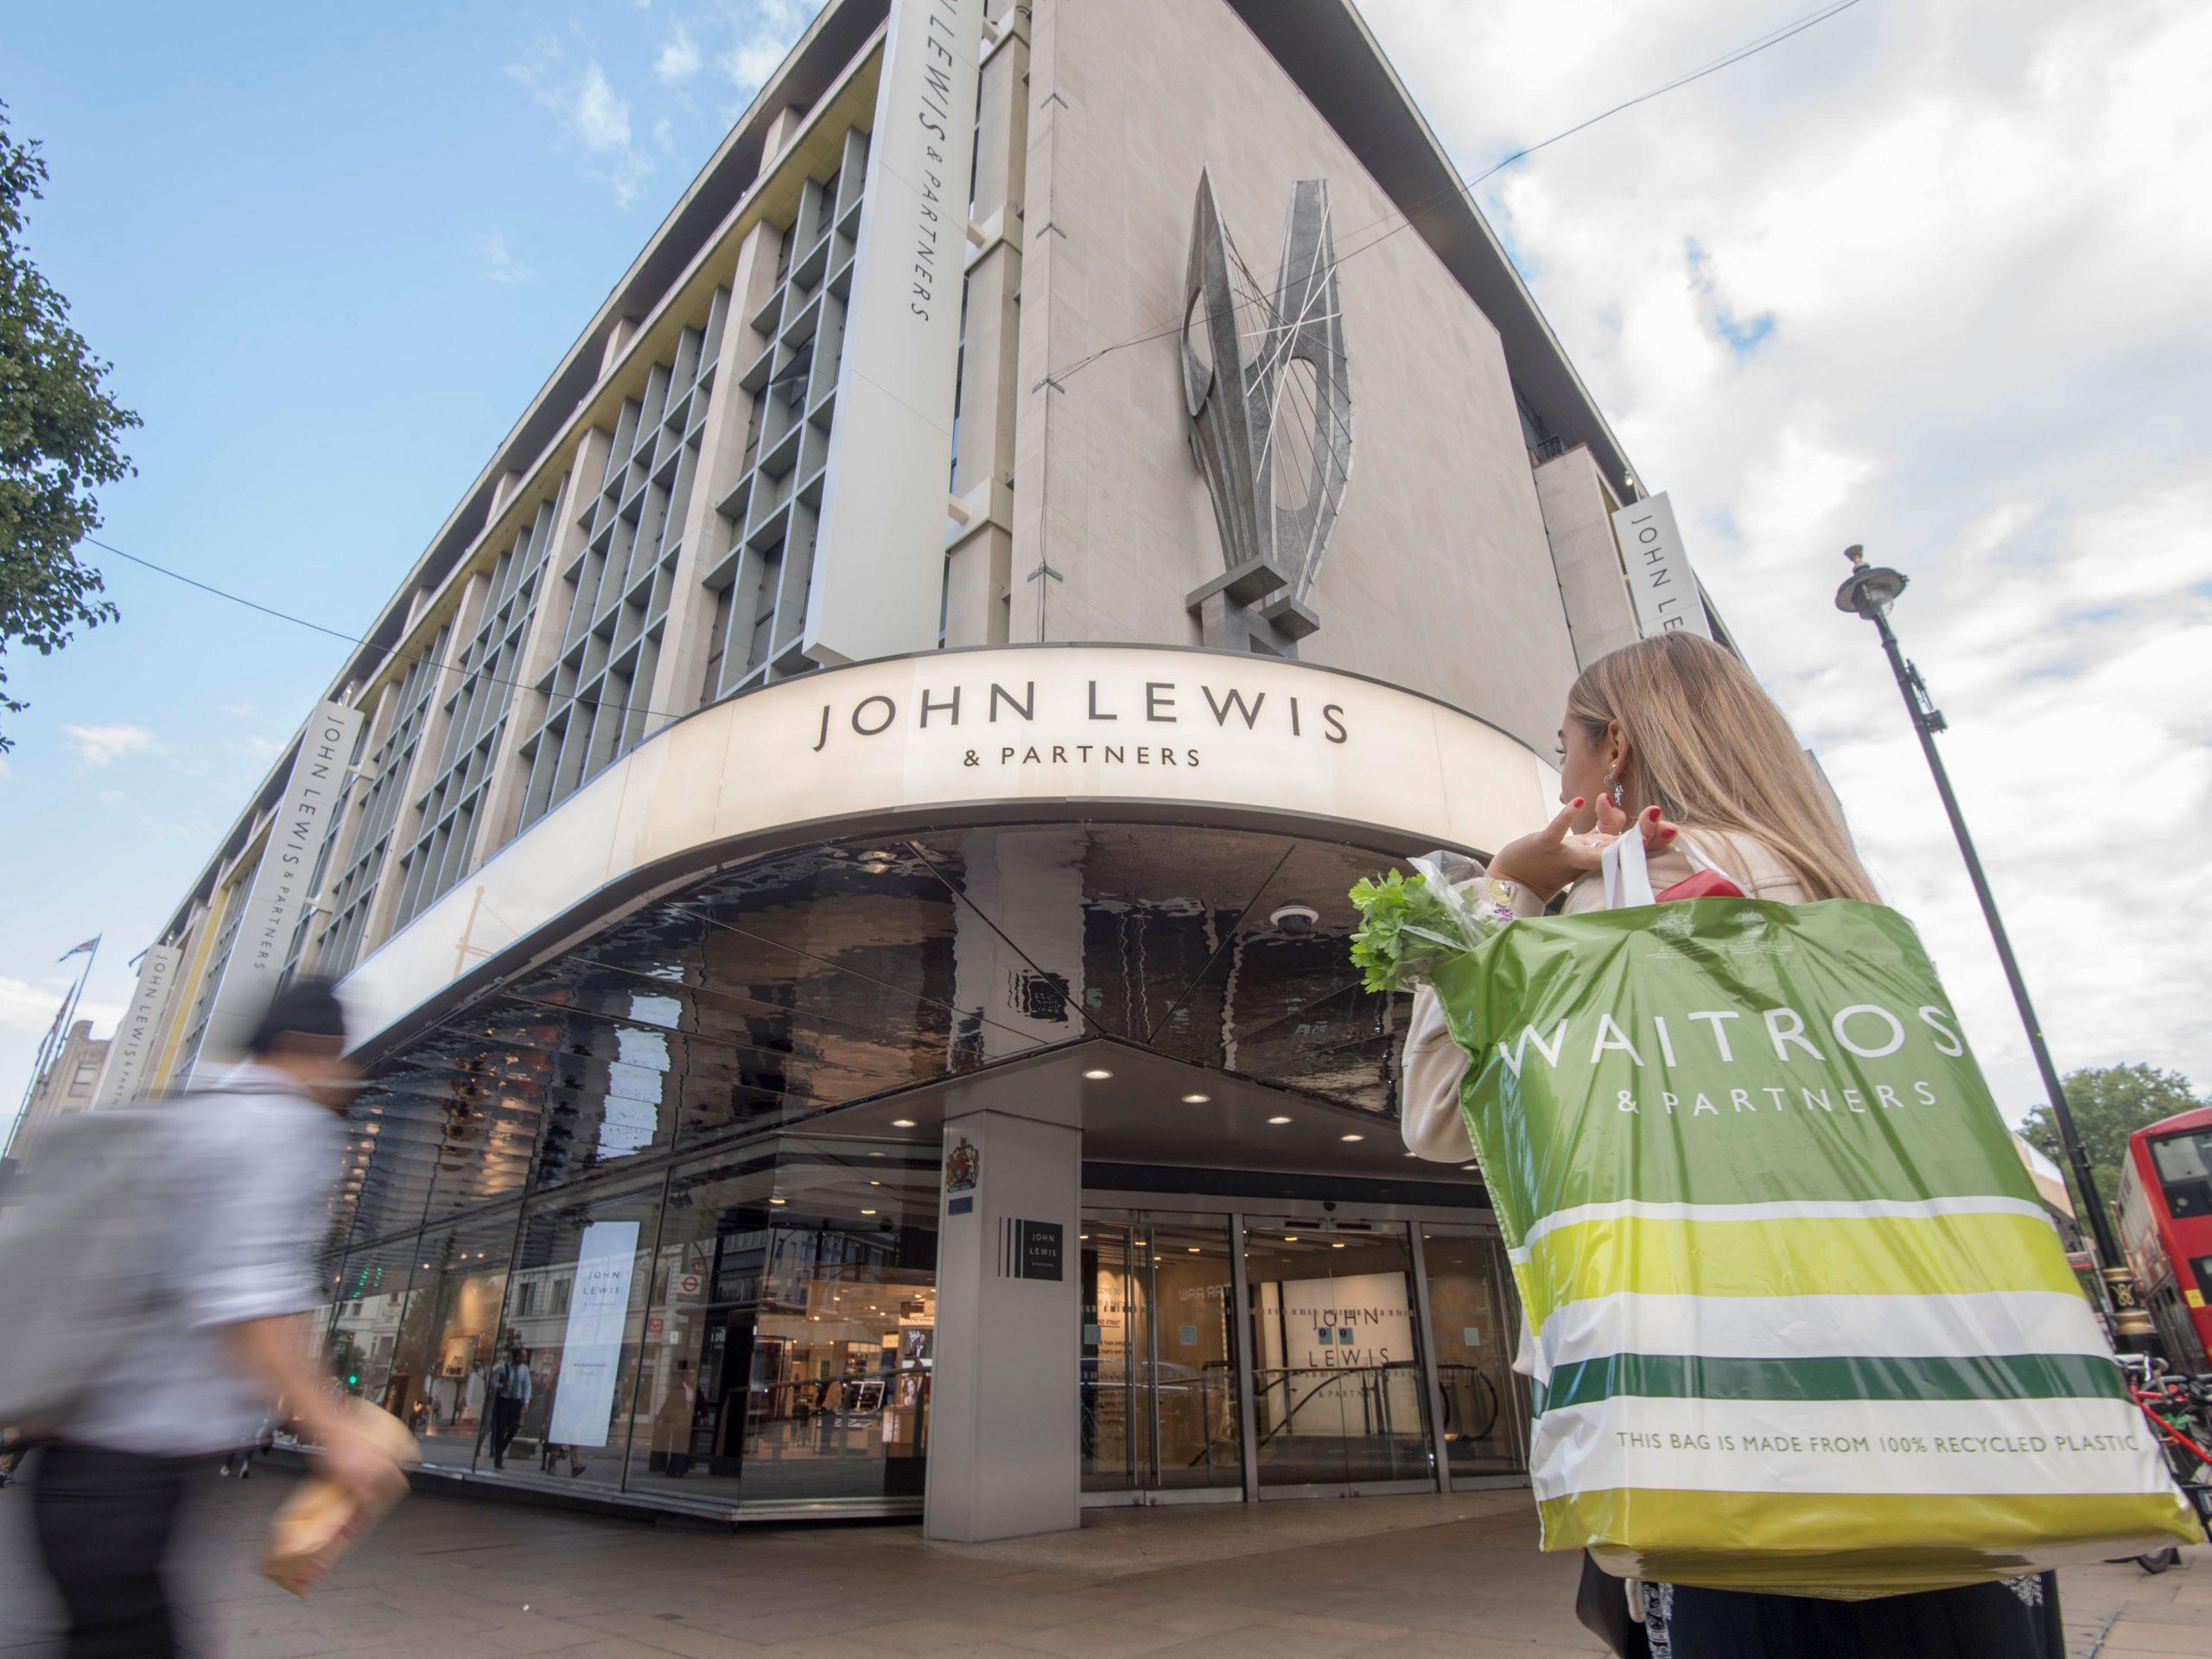 John Lewis, Waitrose Owner to Cut 1000 Jobs